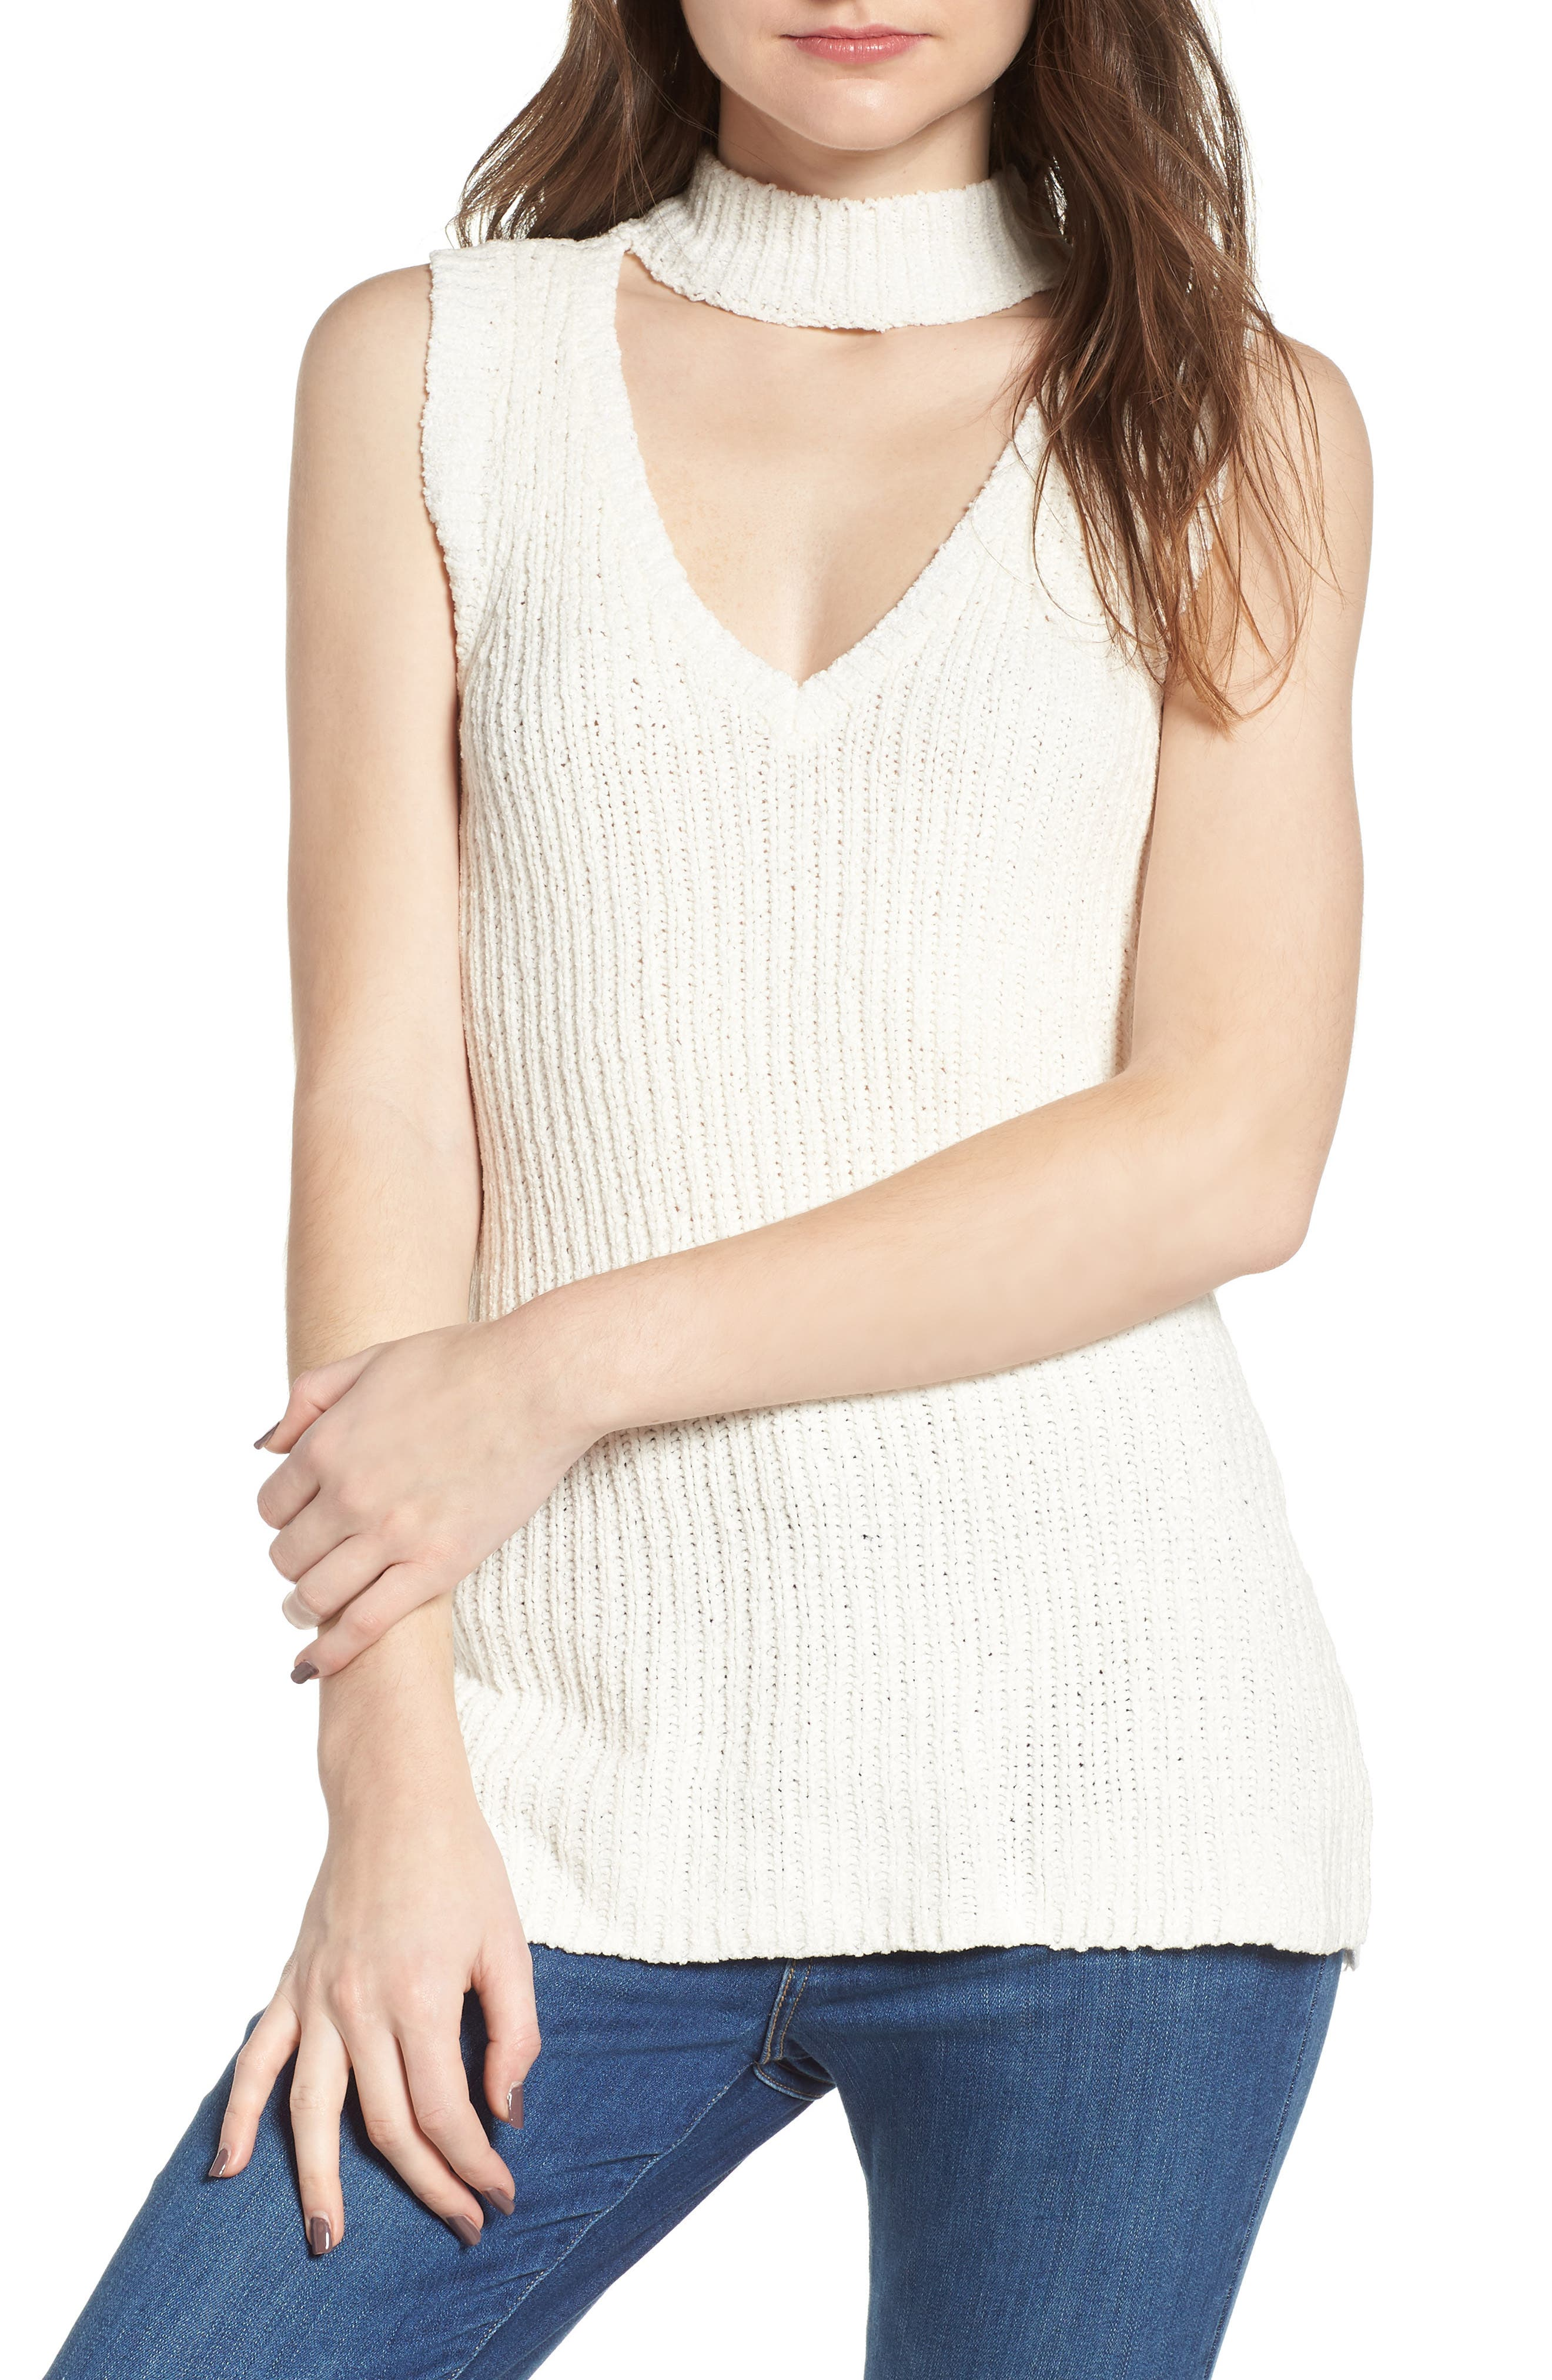 Camdon Sleeveless Sweater,                             Main thumbnail 1, color,                             900